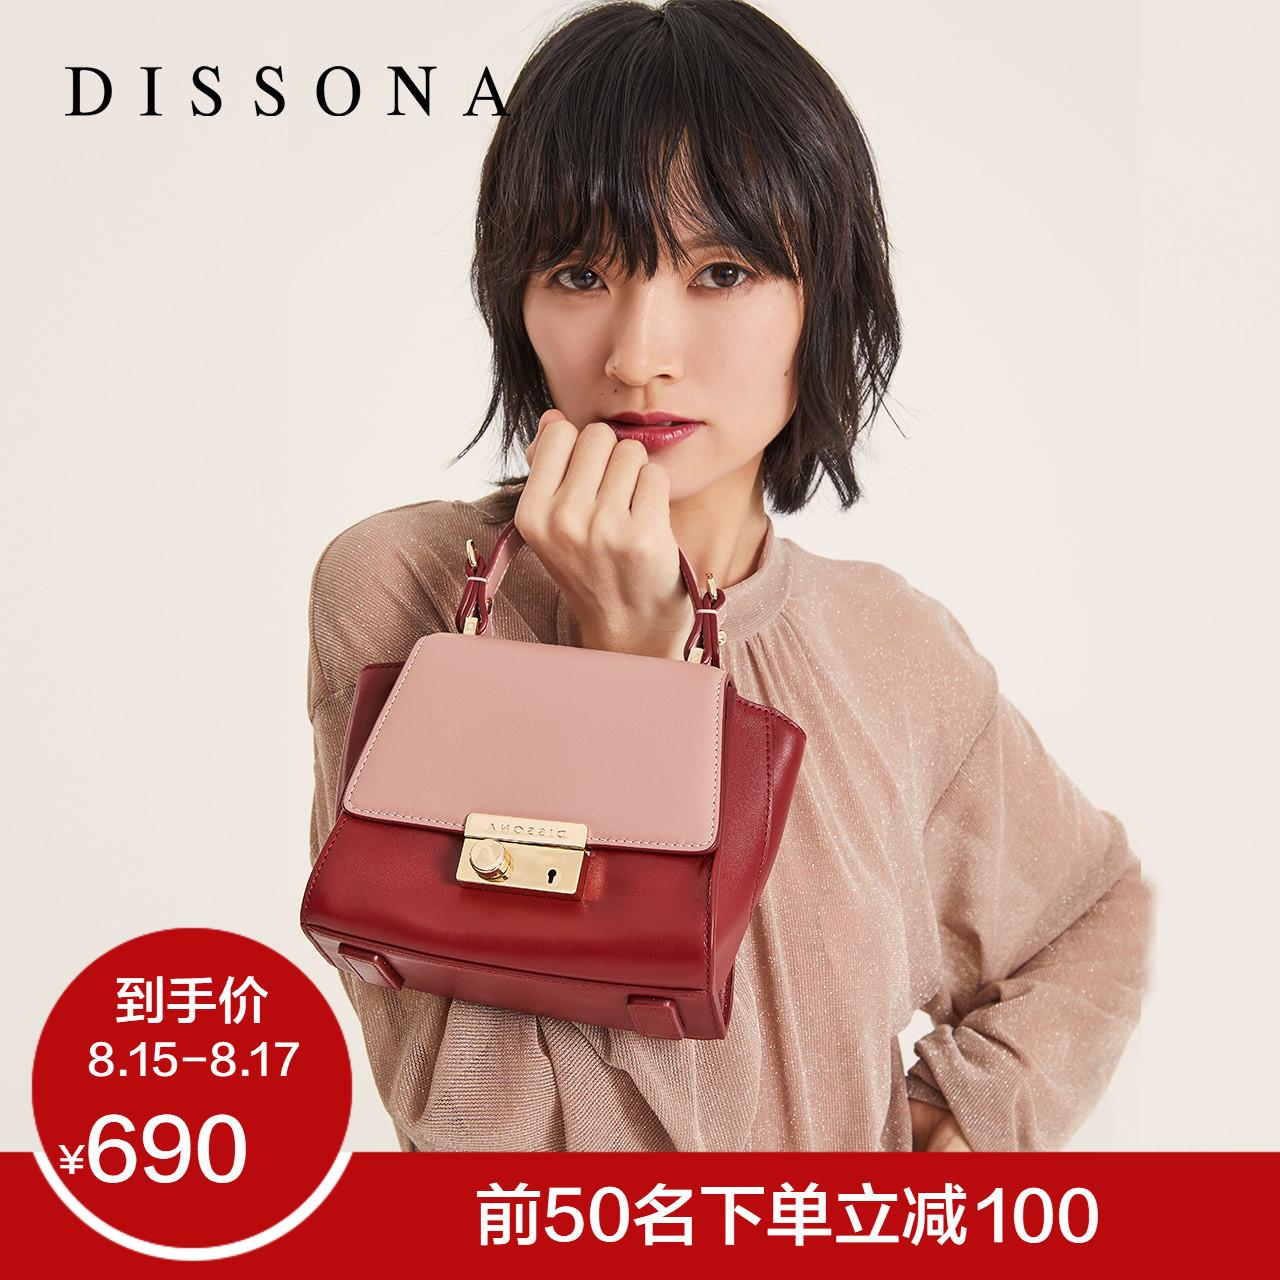 DISSONA迪桑娜手提包真皮女包 時尚包包單肩斜挎包小包蝙蝠翅膀包